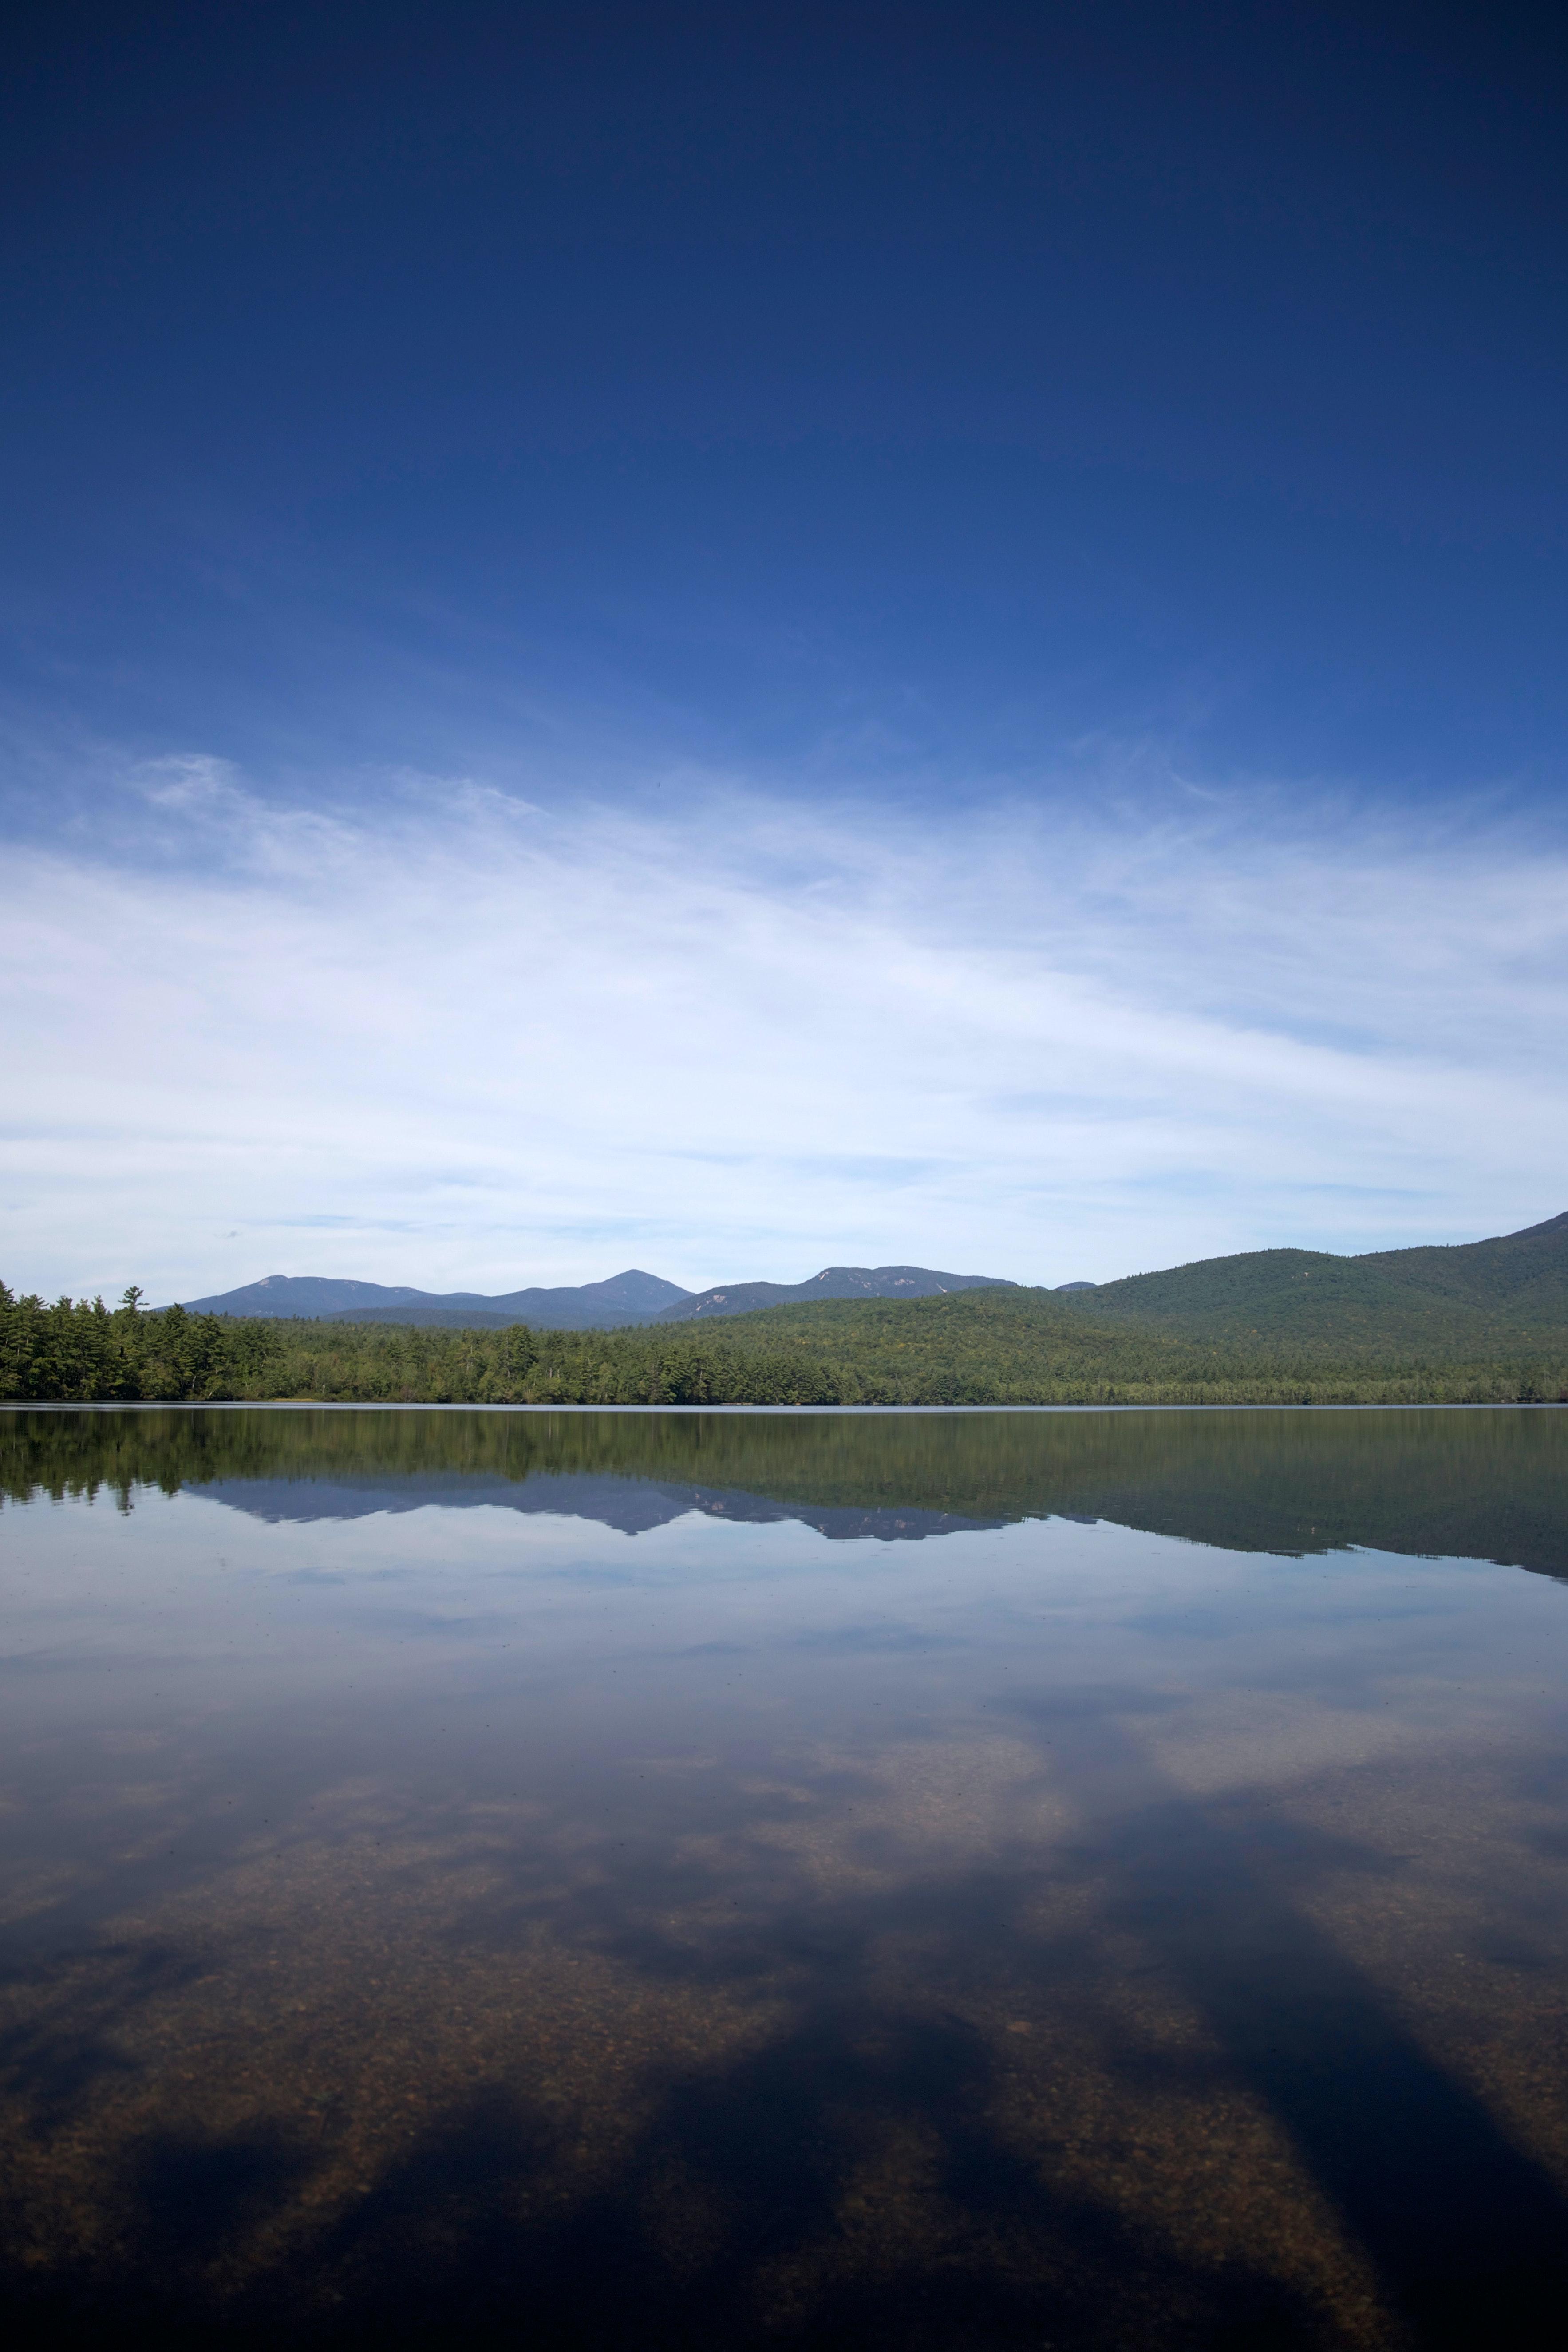 Landscape Photography Of Lake And Tree 183 Free Stock Photo